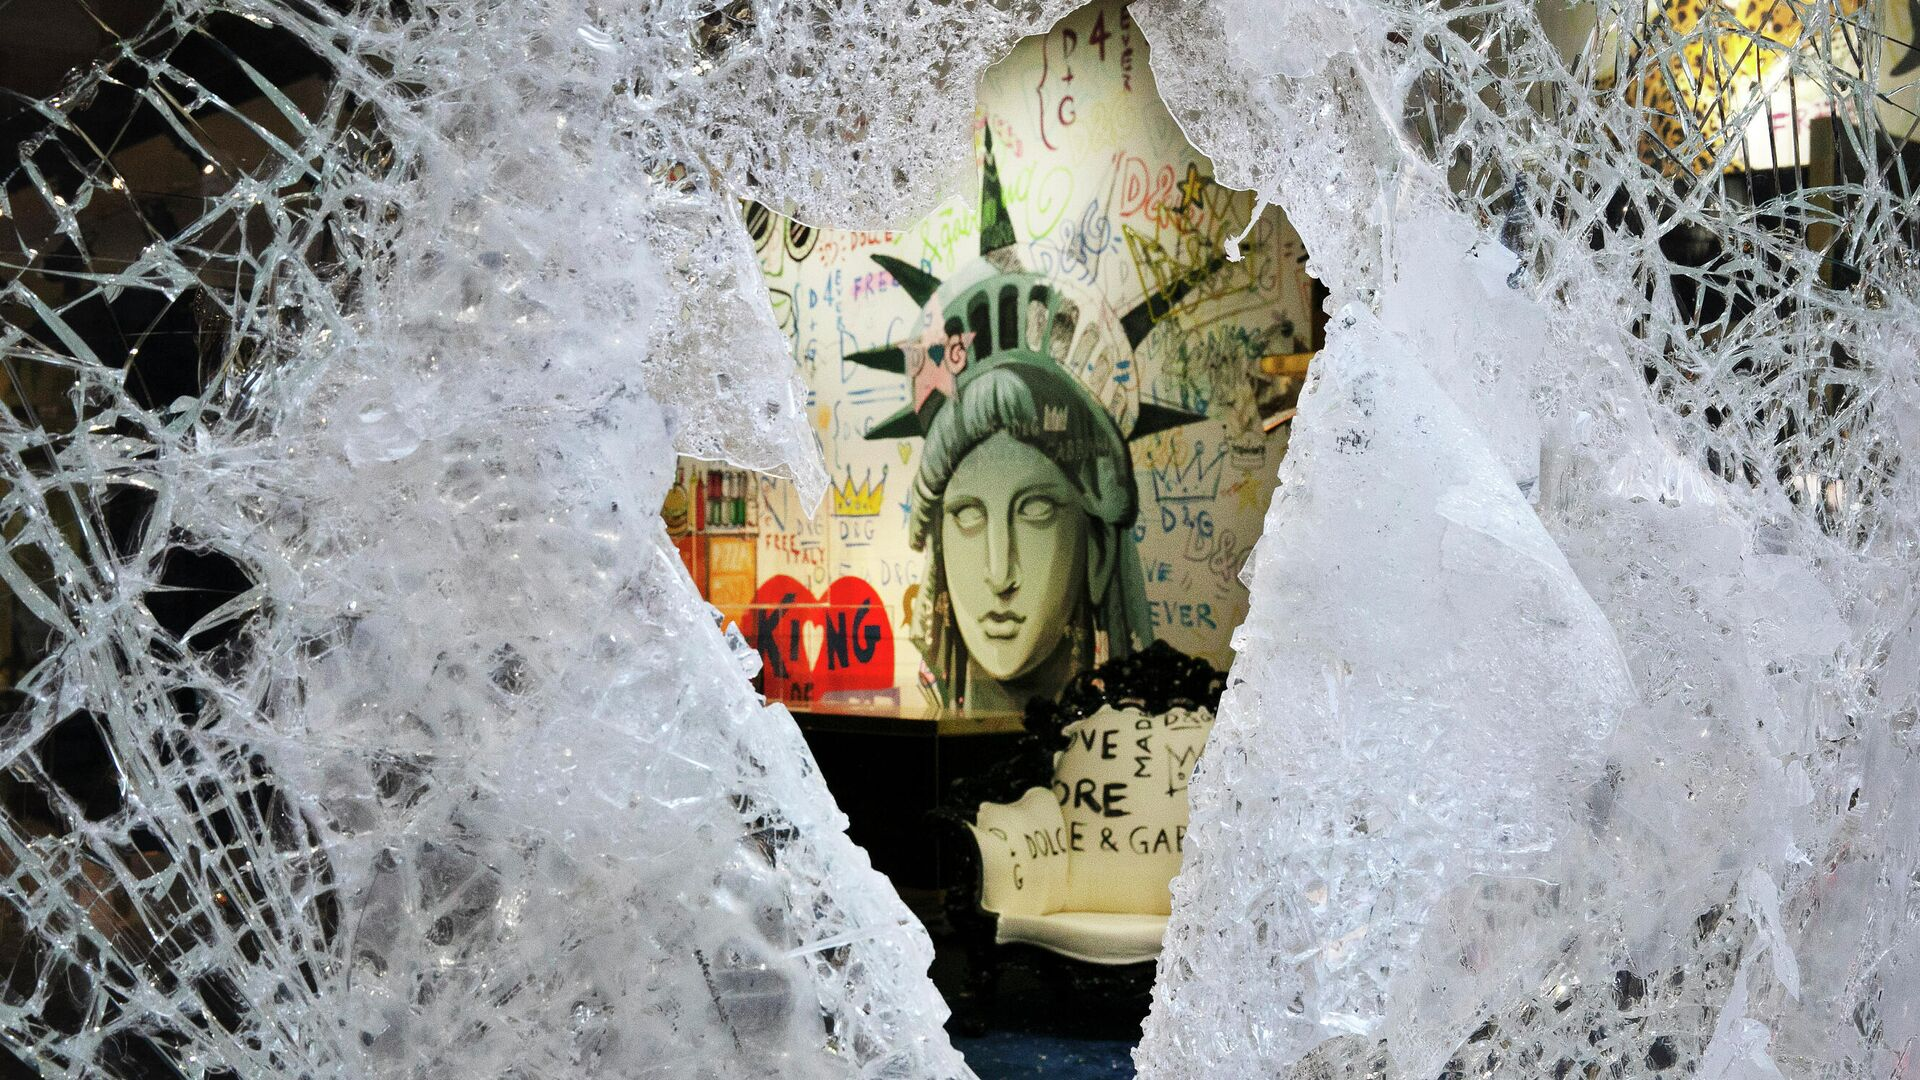 Разбитая витрина магазина Dolce and Gabbana в Нью-Йорке - РИА Новости, 1920, 14.06.2020